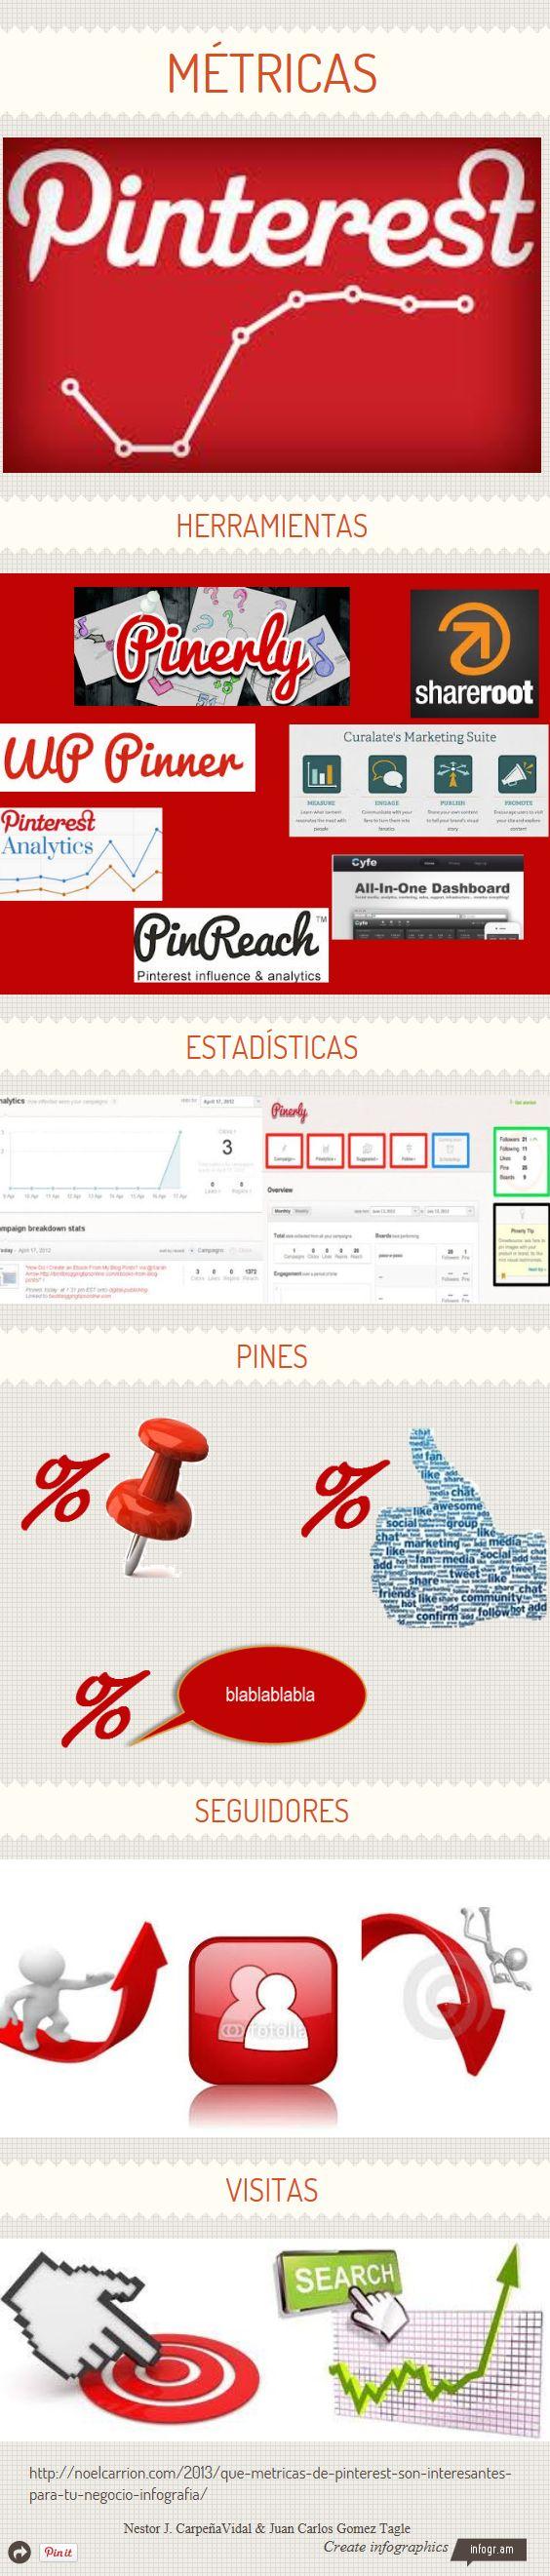 Pinterest Metricas